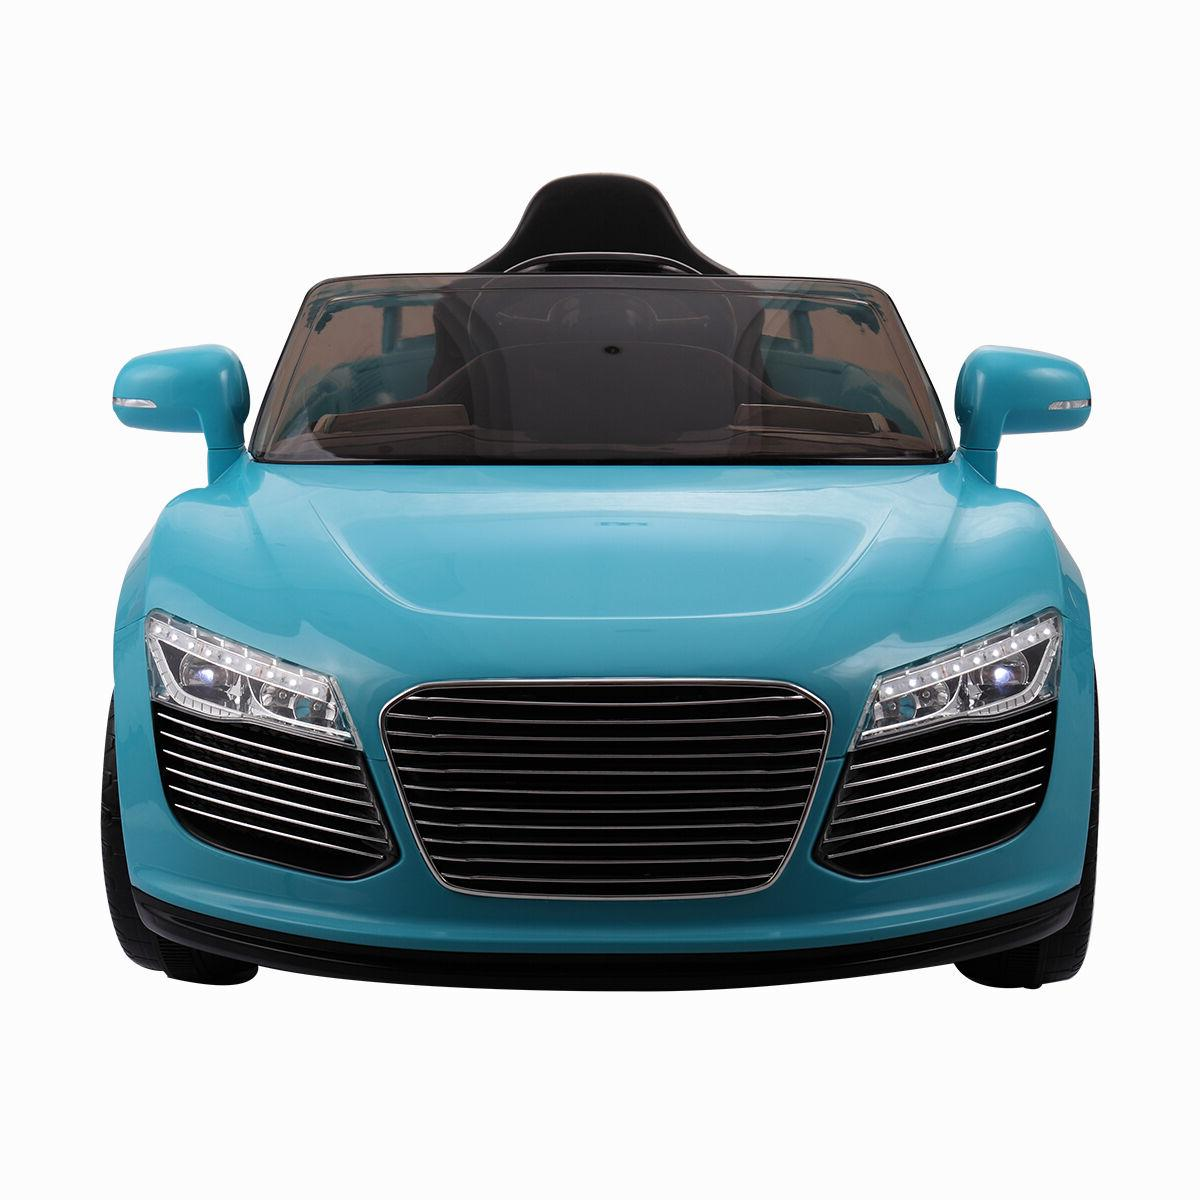 12V Ride on Kids RC Car Remote Control Power Wheels W/MP3